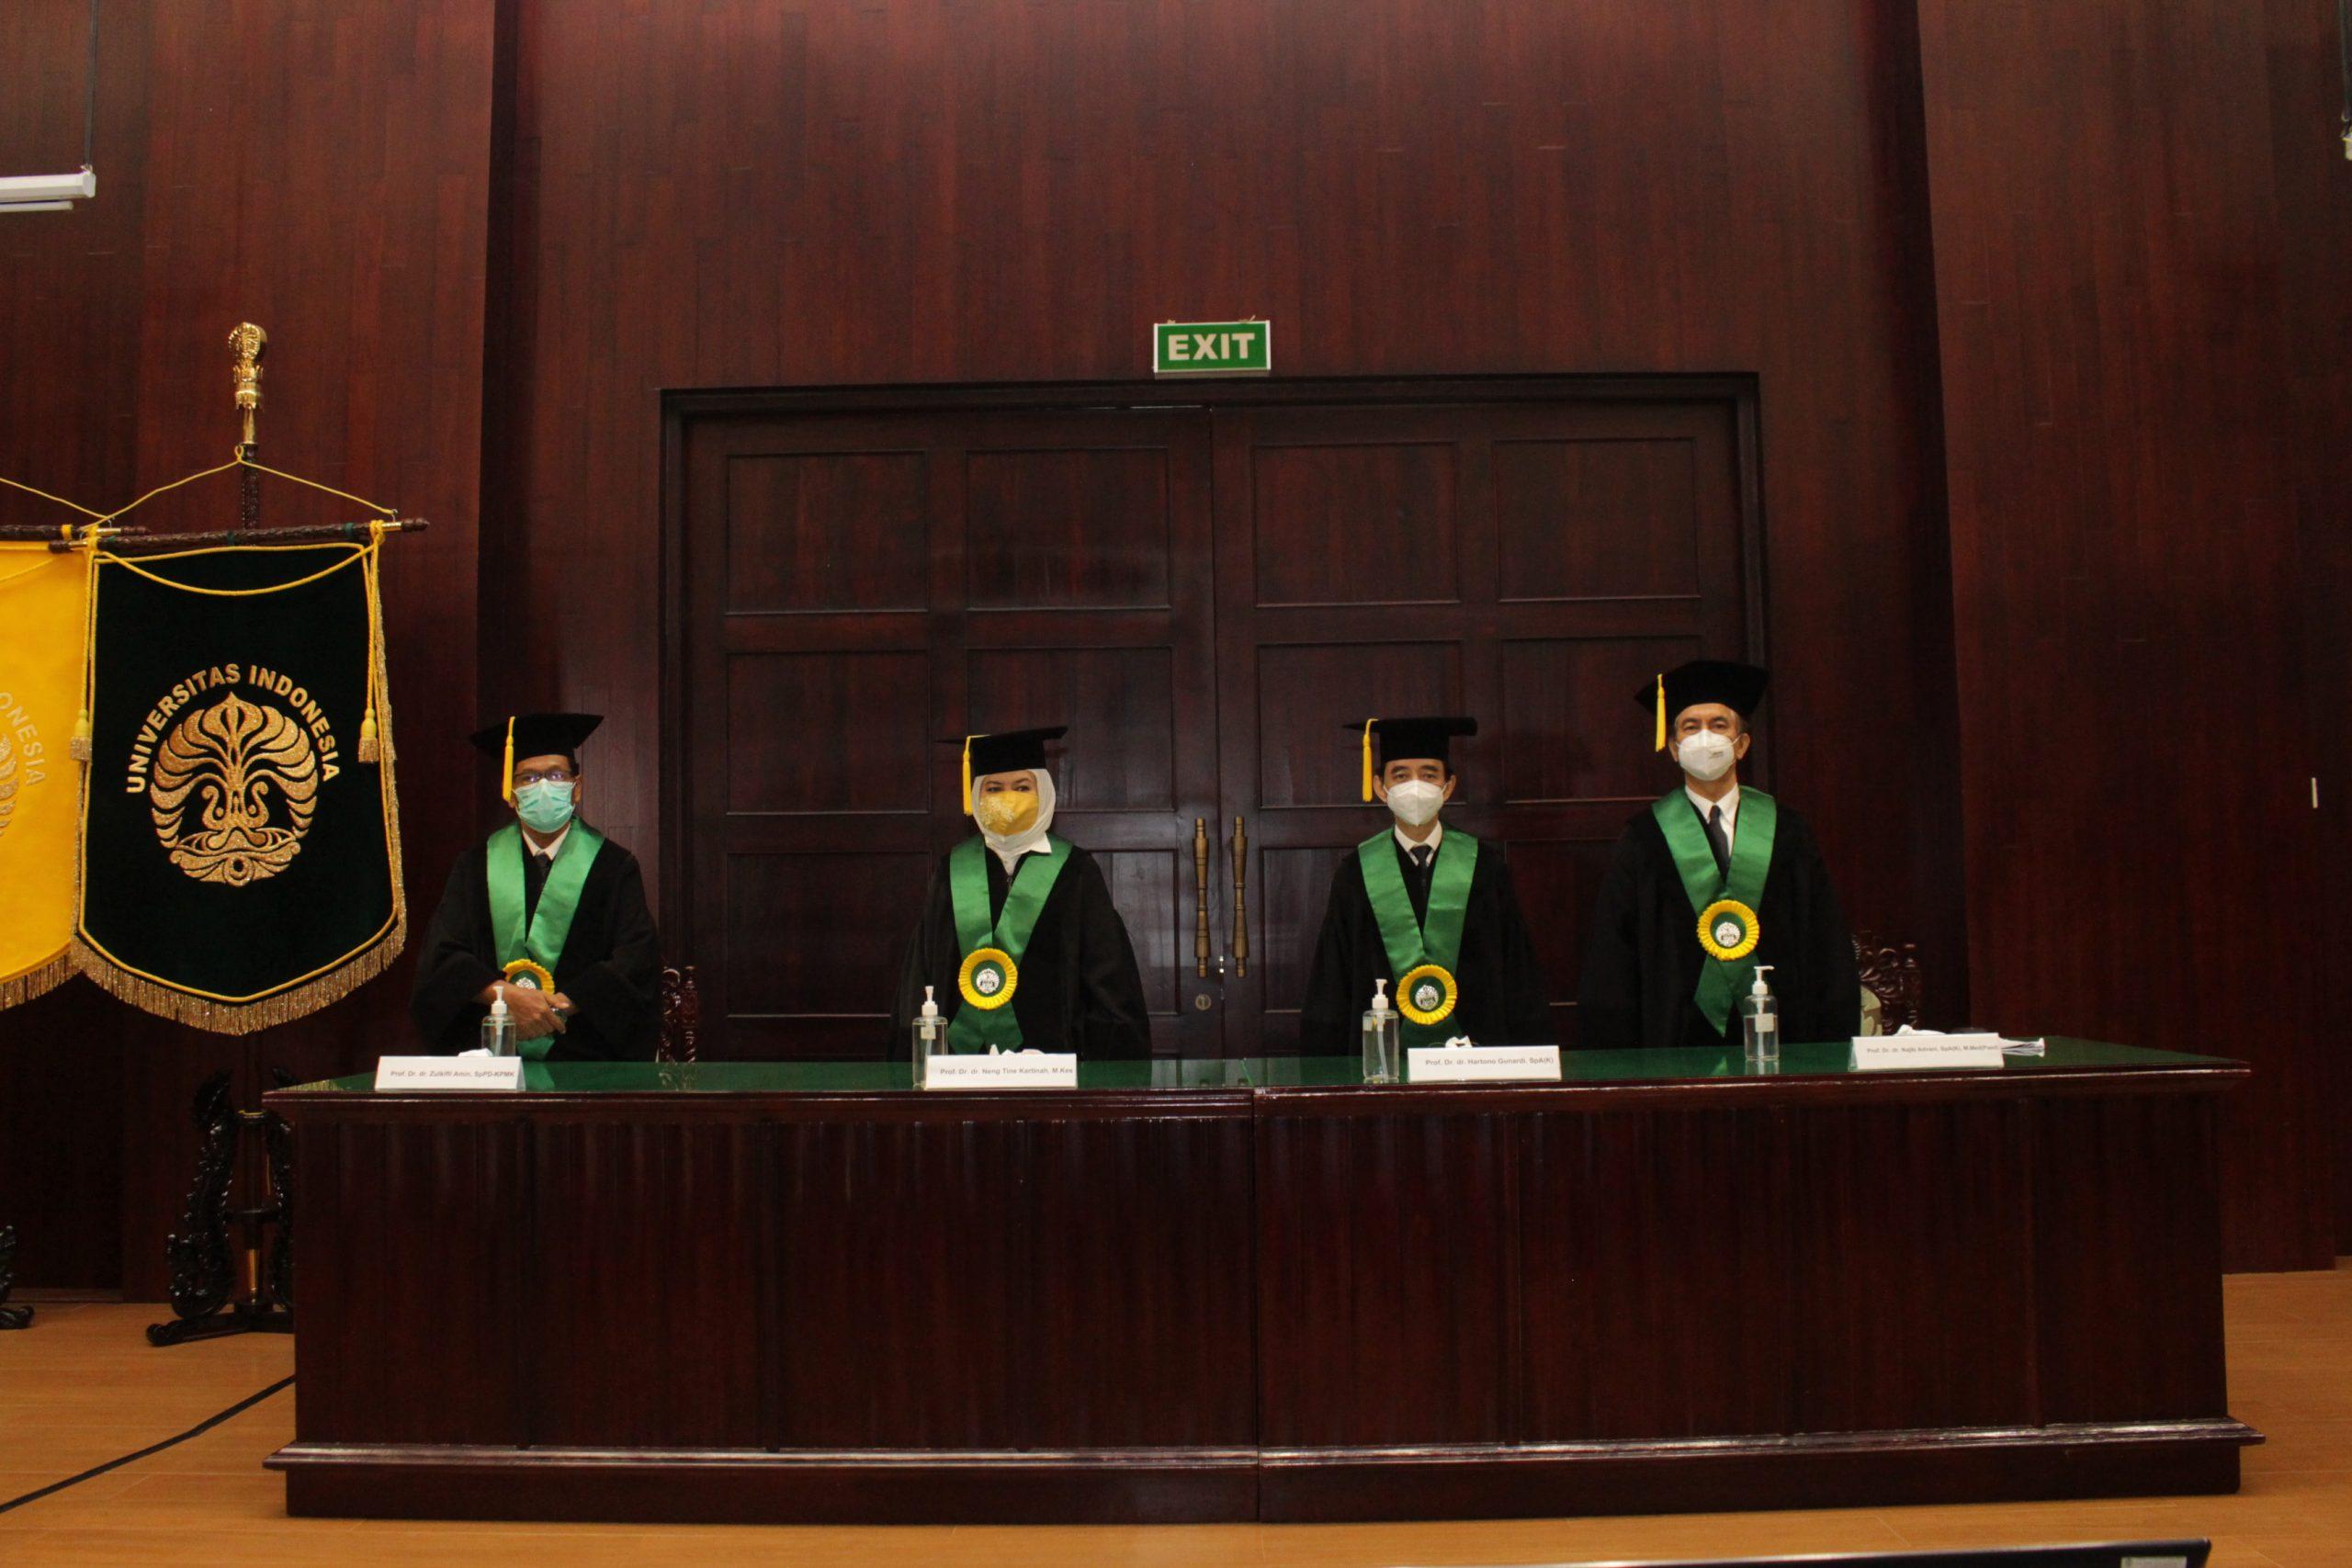 Pengukuhan Guru Besar Prof. Dr. dr. Zulkifli Amin, SpPD-KPMK, Prof. Dr. dr. Neng Tine Kartinah, M.Kes, Prof. Dr. dr. Hartono Gunardi, SpA(K)